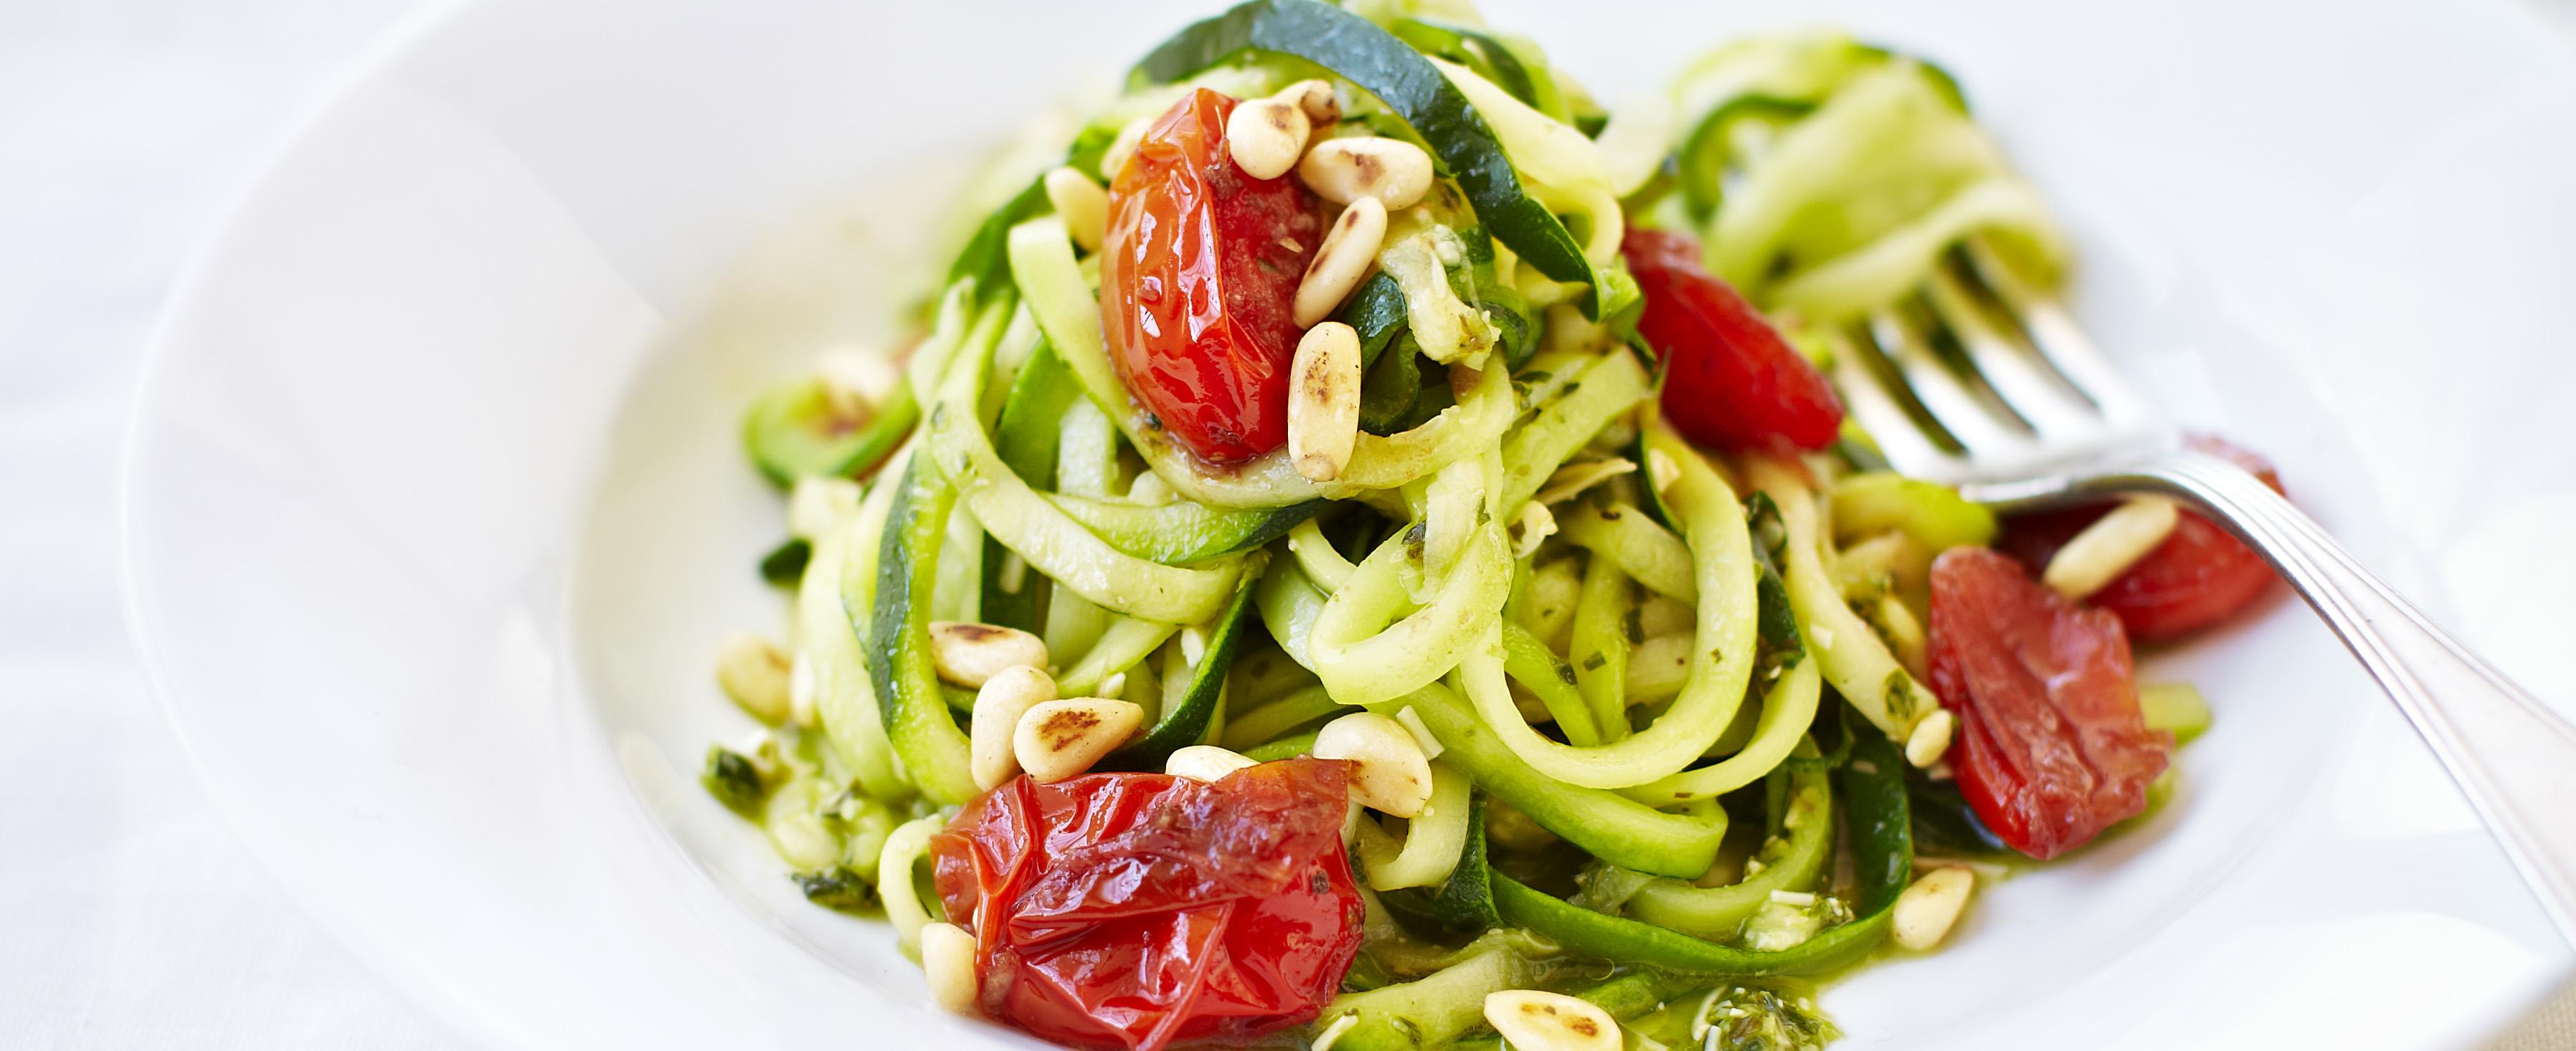 Spiralizer Recipes And Courgetti Guide Olive Magazine